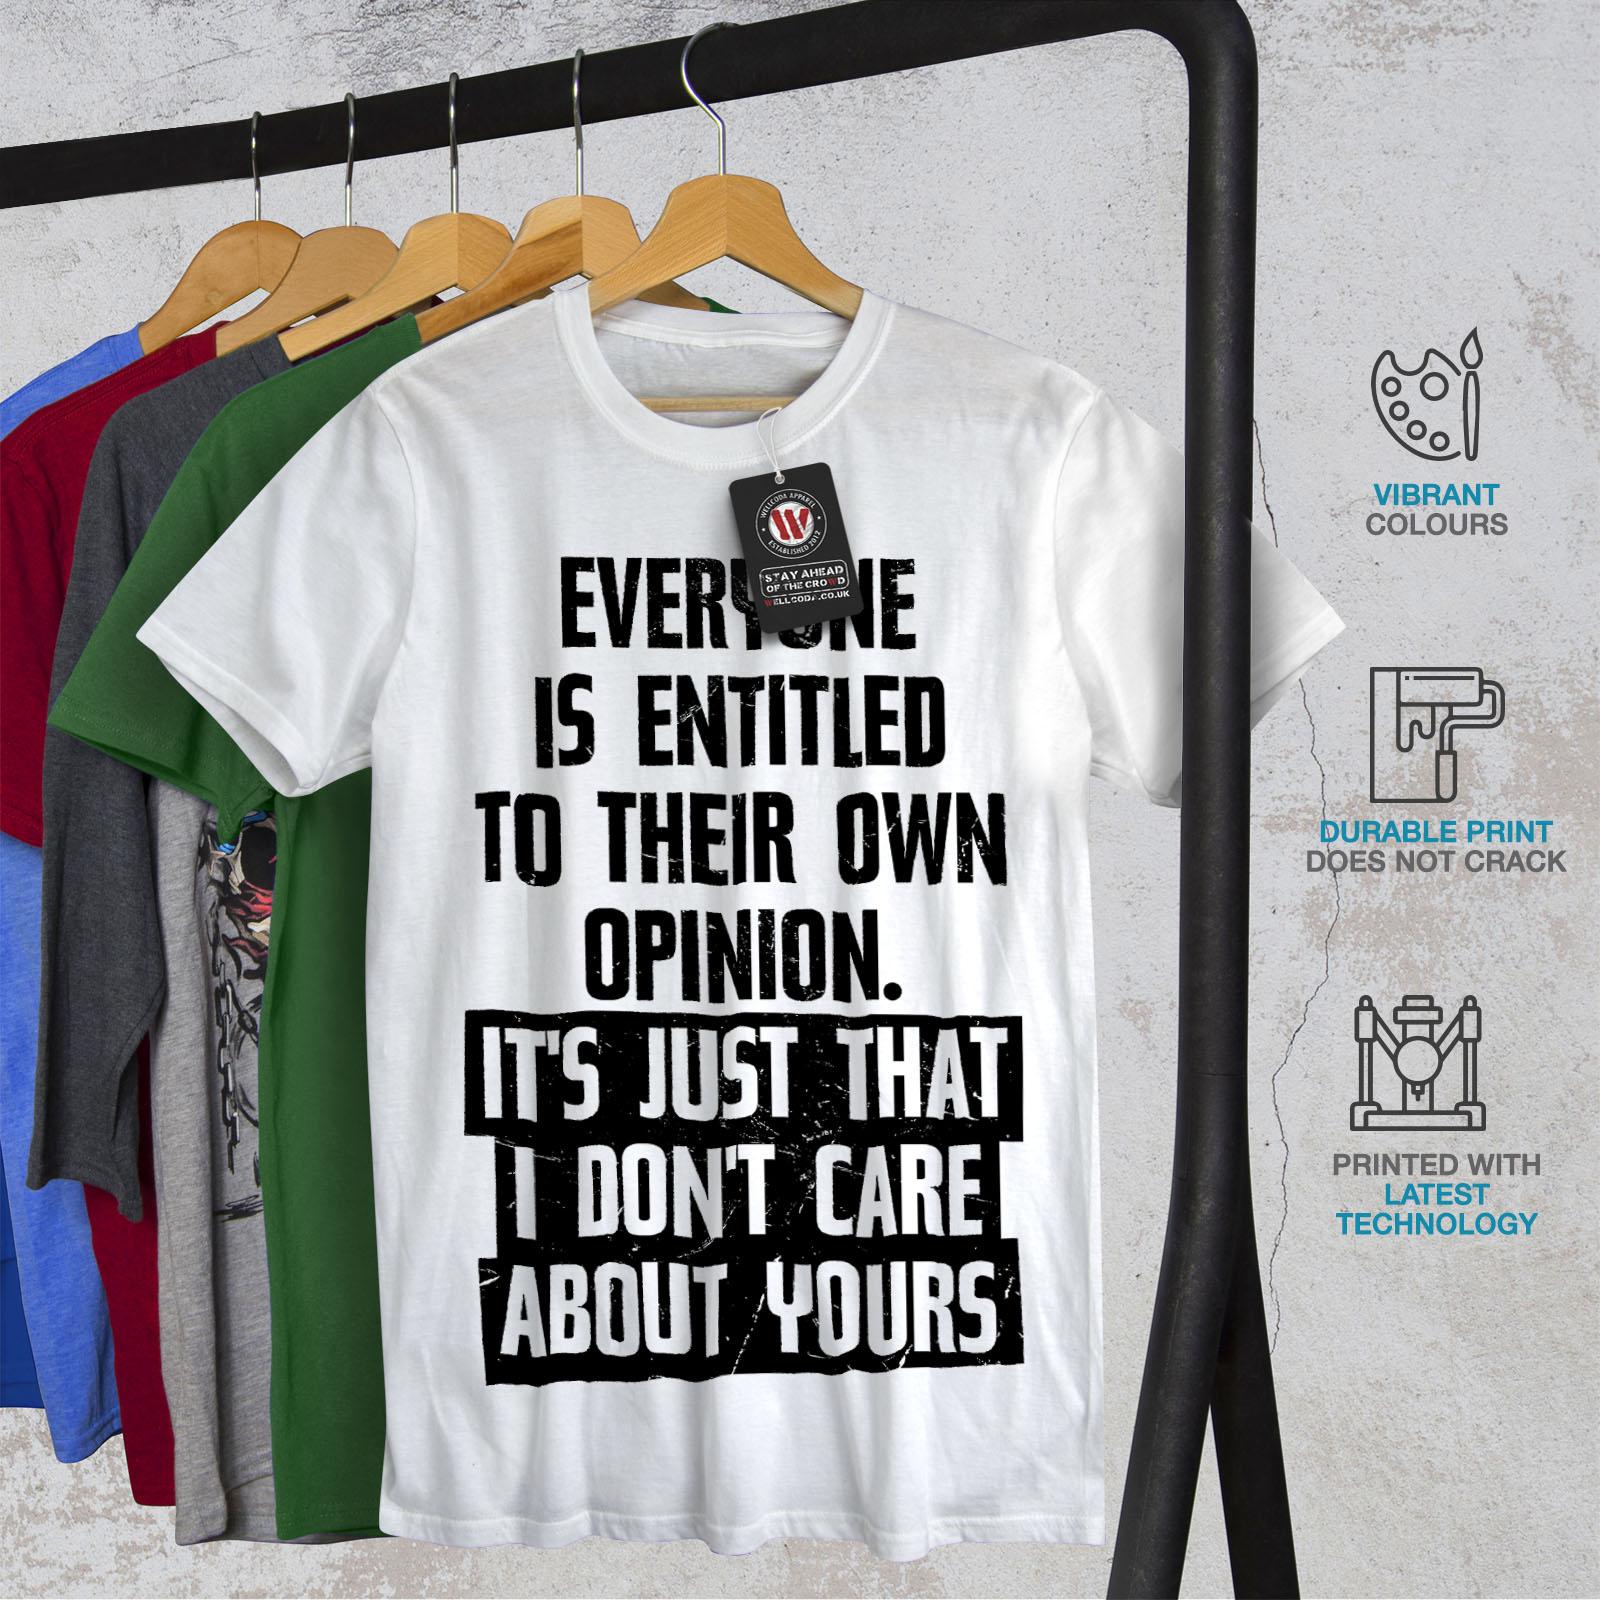 Multitasking T Shirt Funny Joke Listen Slogan Wellcoda Tee Graphic Ignore Forget